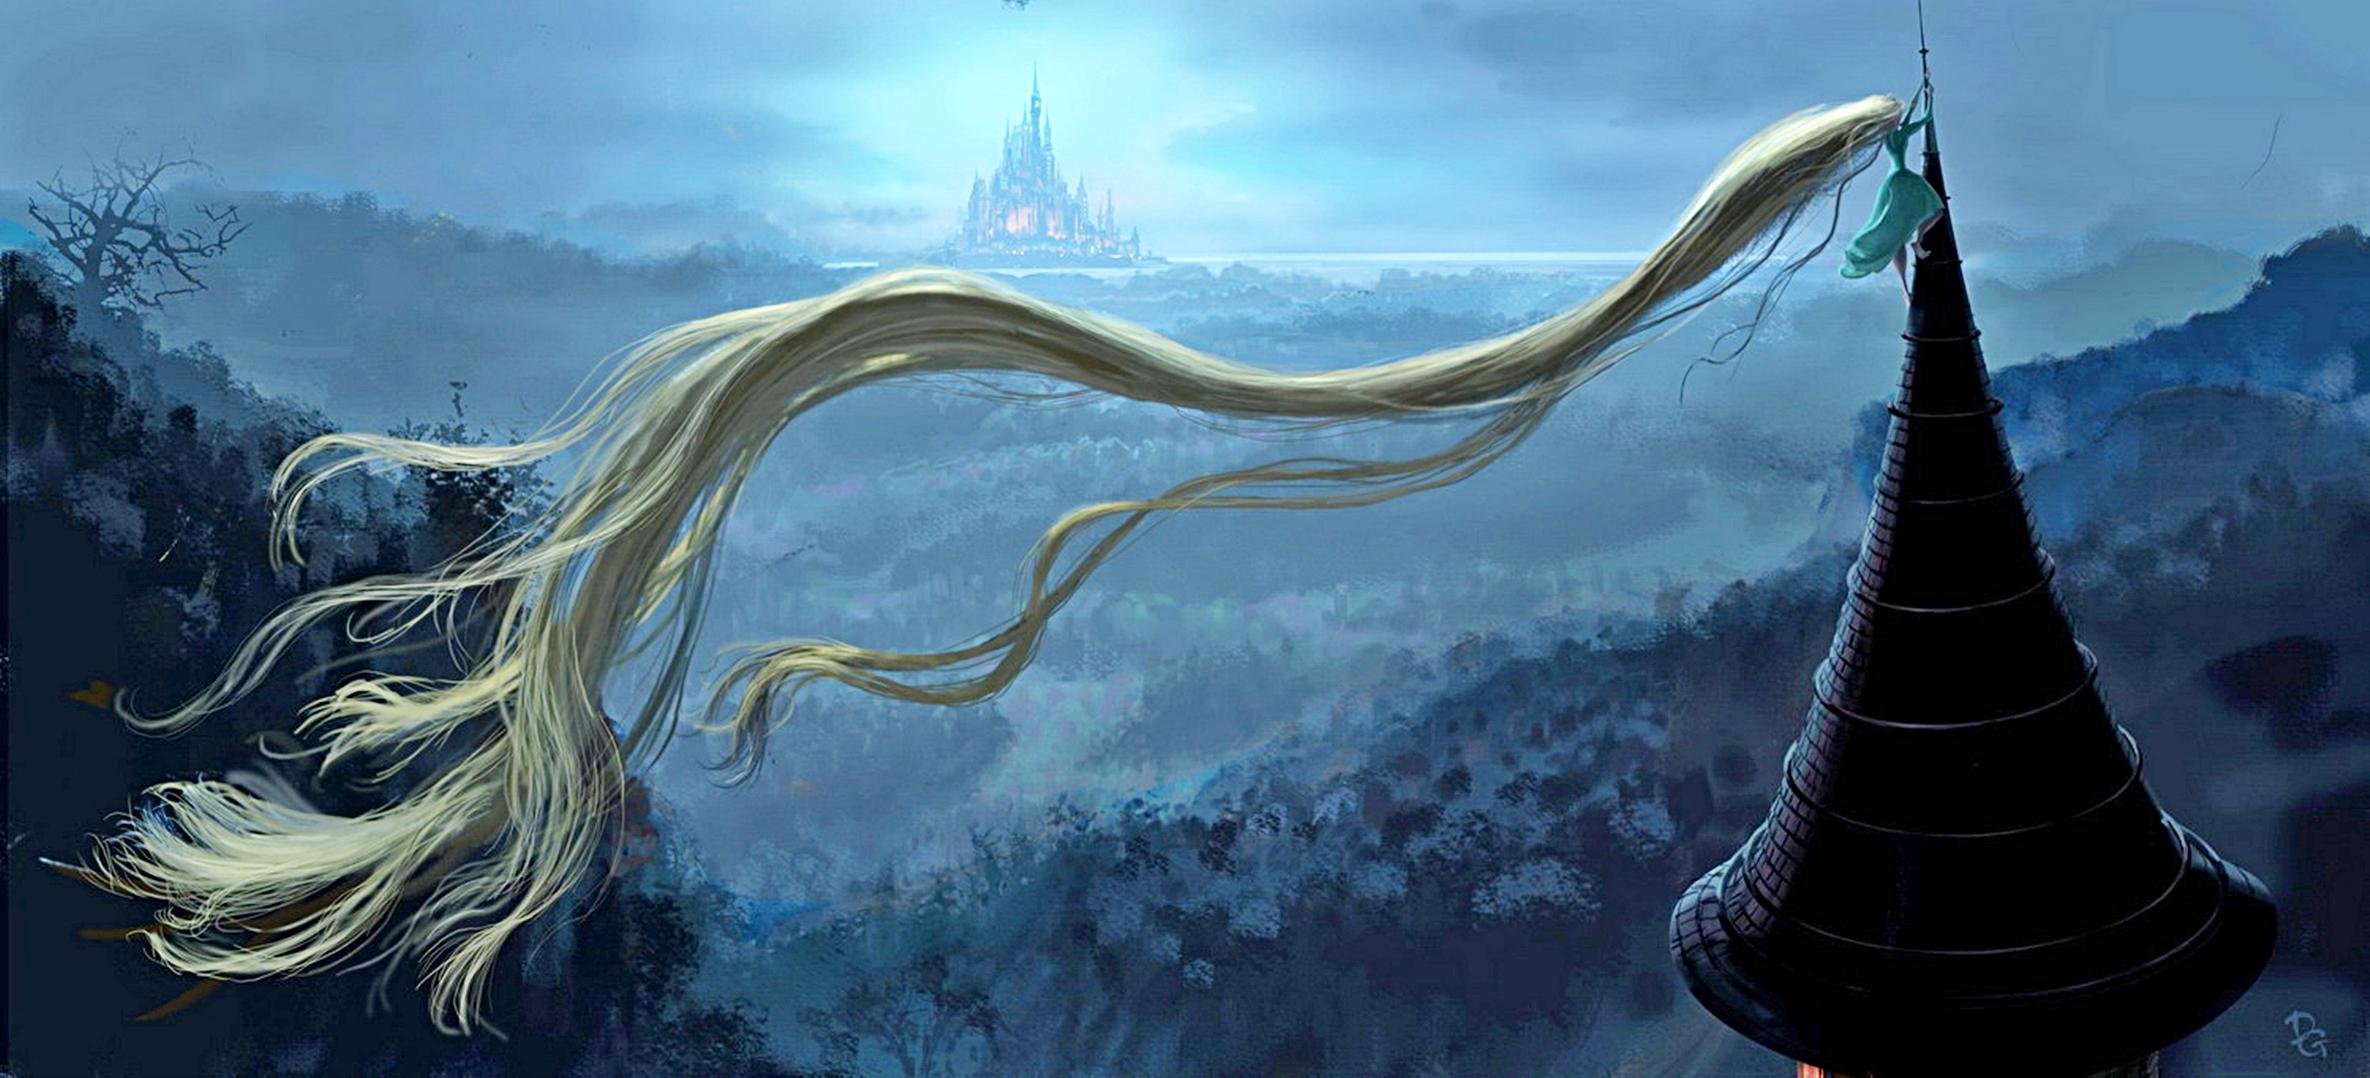 NAVER まとめ「塔の上のラプンツェル」コンセプトアート。ディズニーのアニメーターが描いた魅力的な…